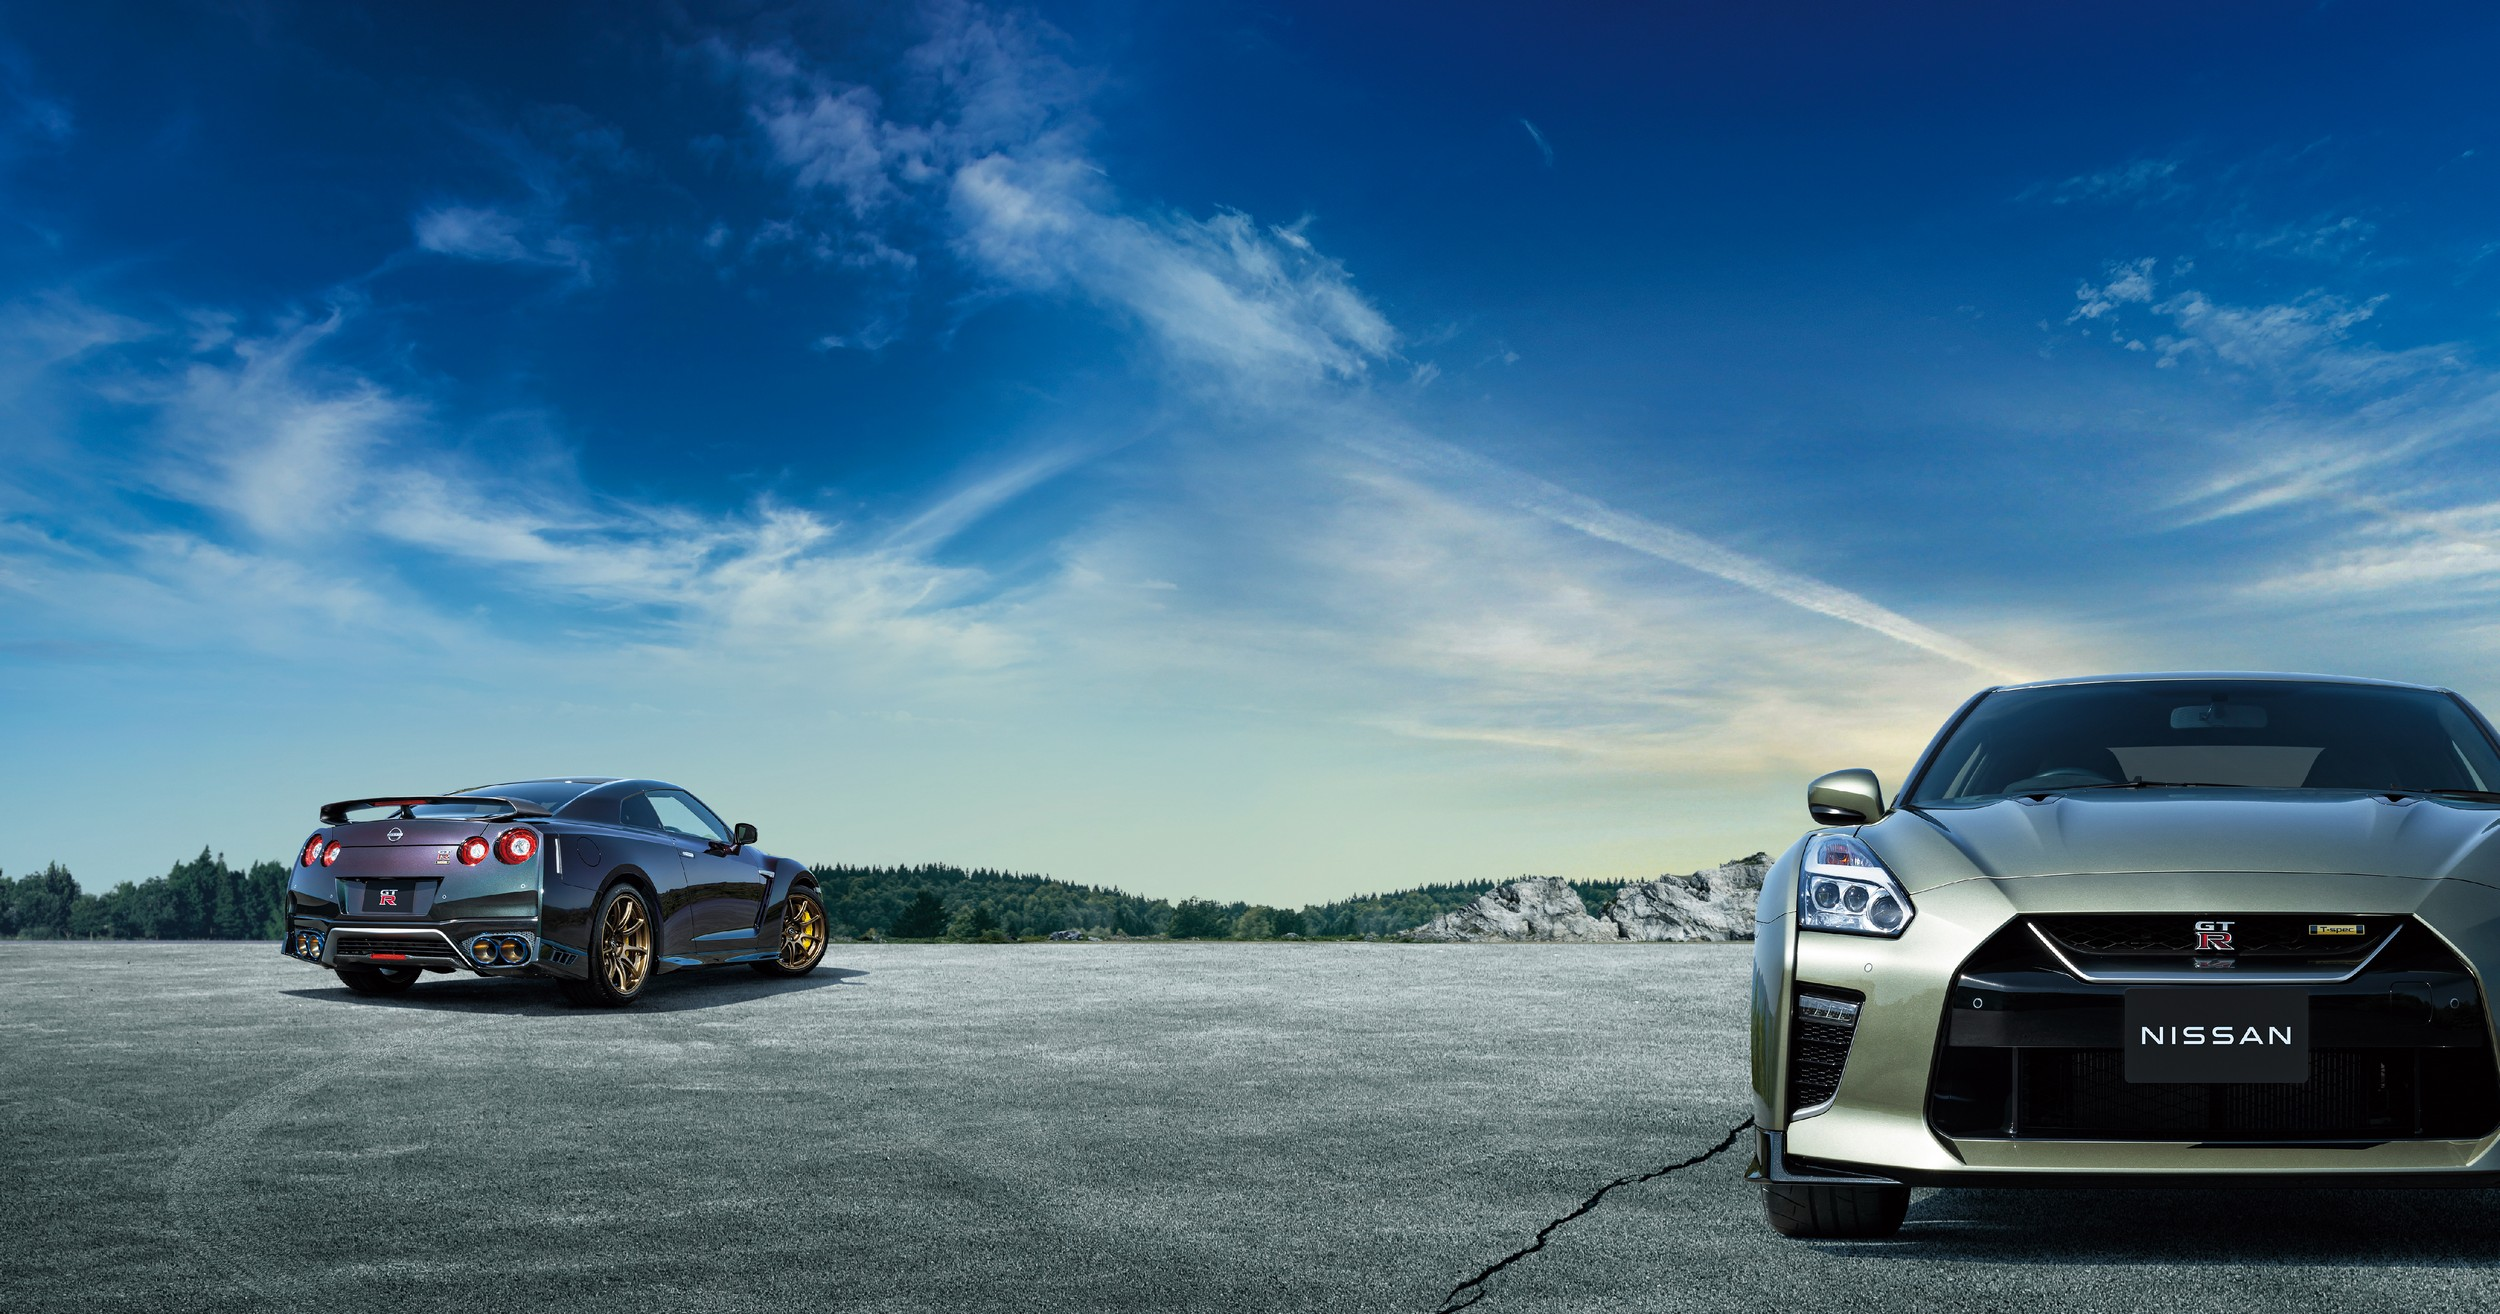 2022 Nissan GTR